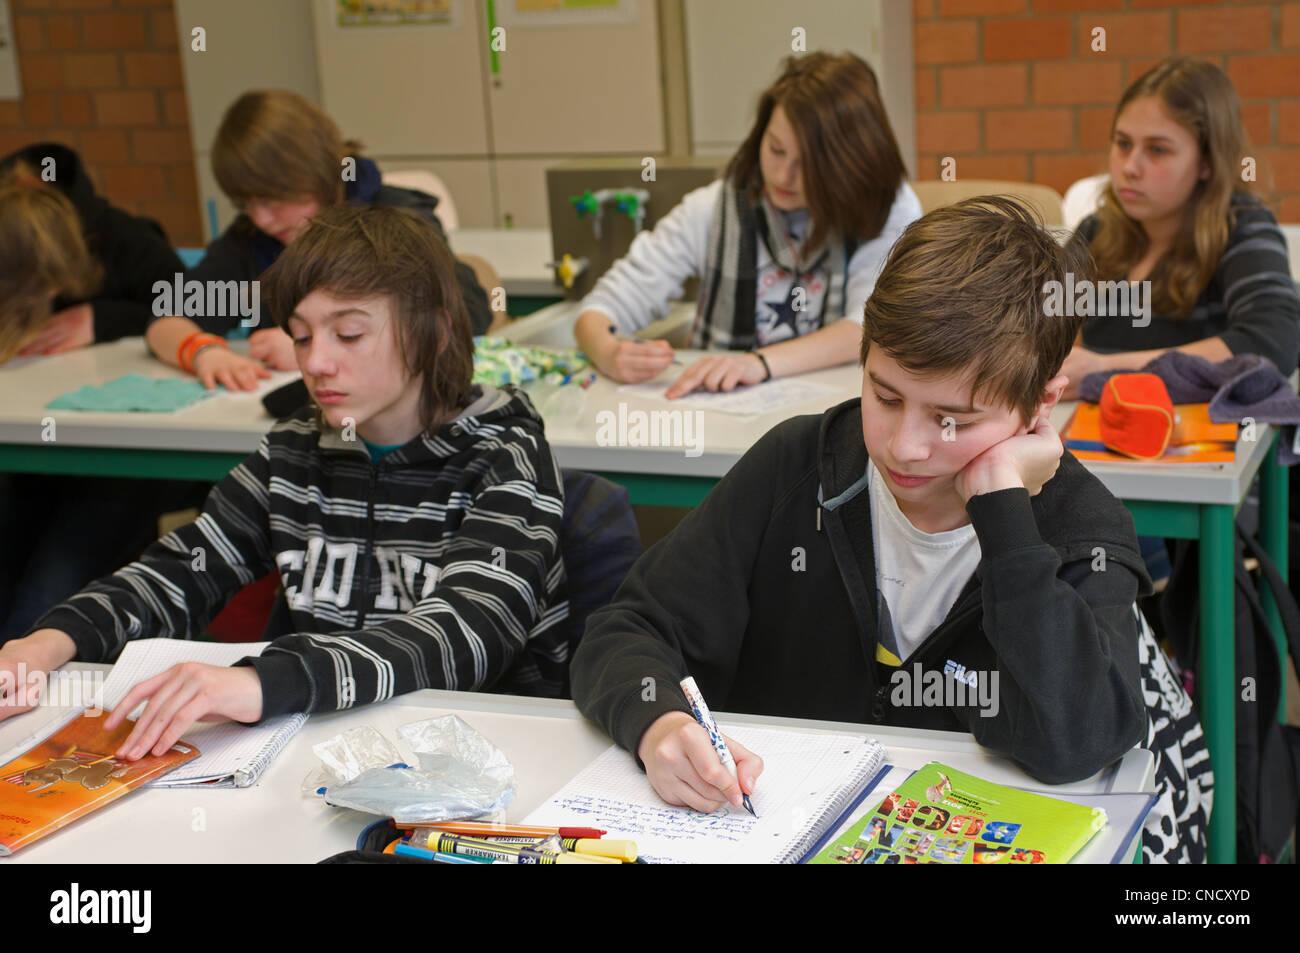 Schoolchildren Germany - Stock Image